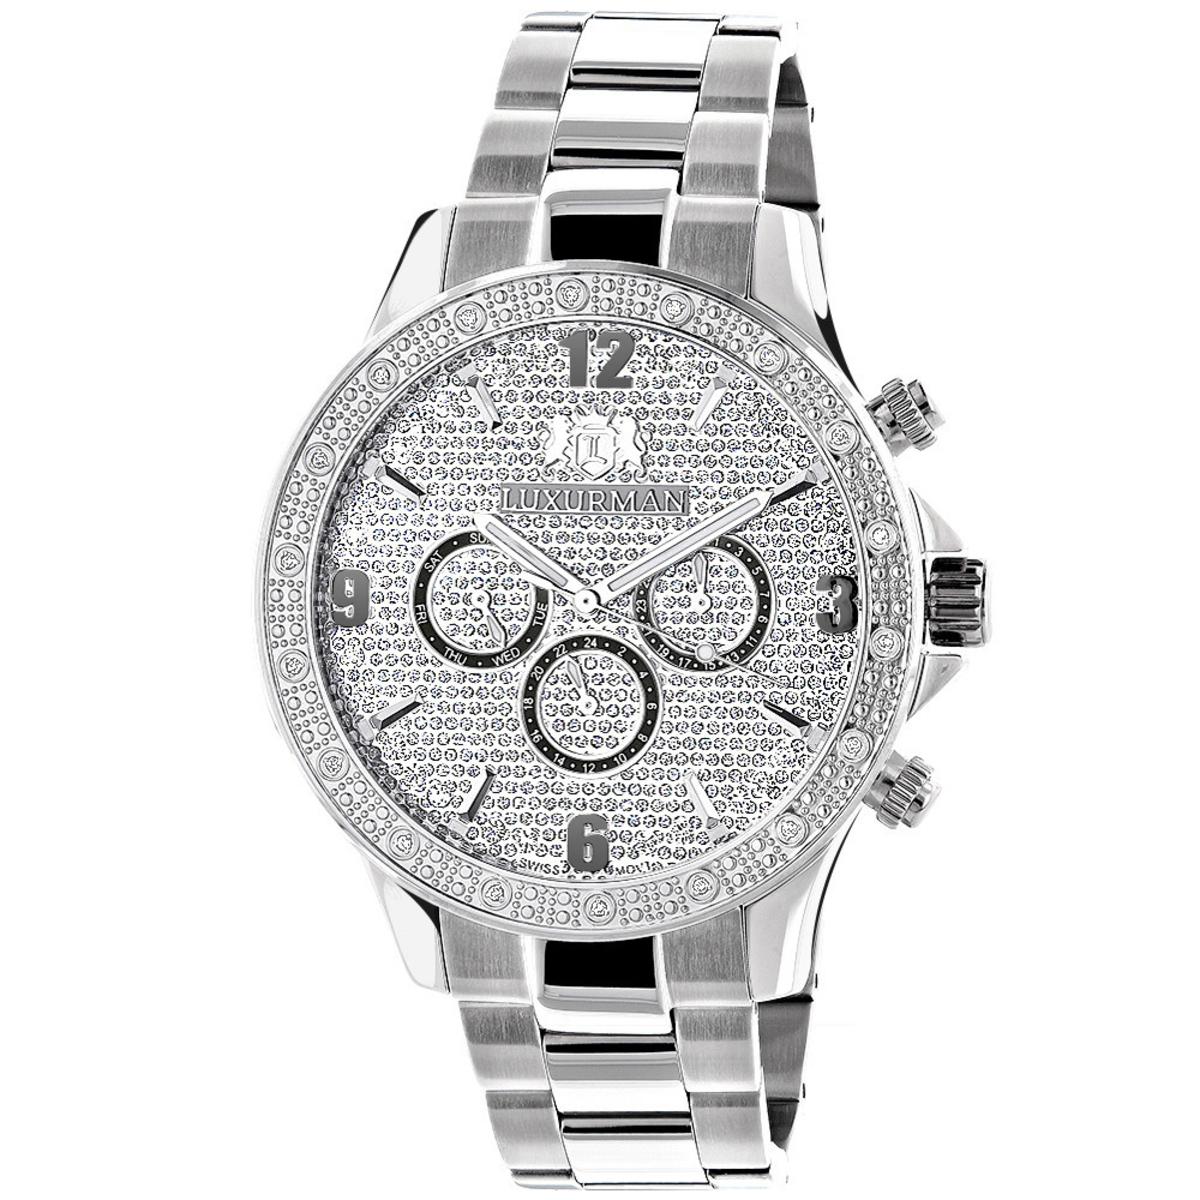 Mens Diamond Watches: Luxurman Midsize Watch 0.2ct